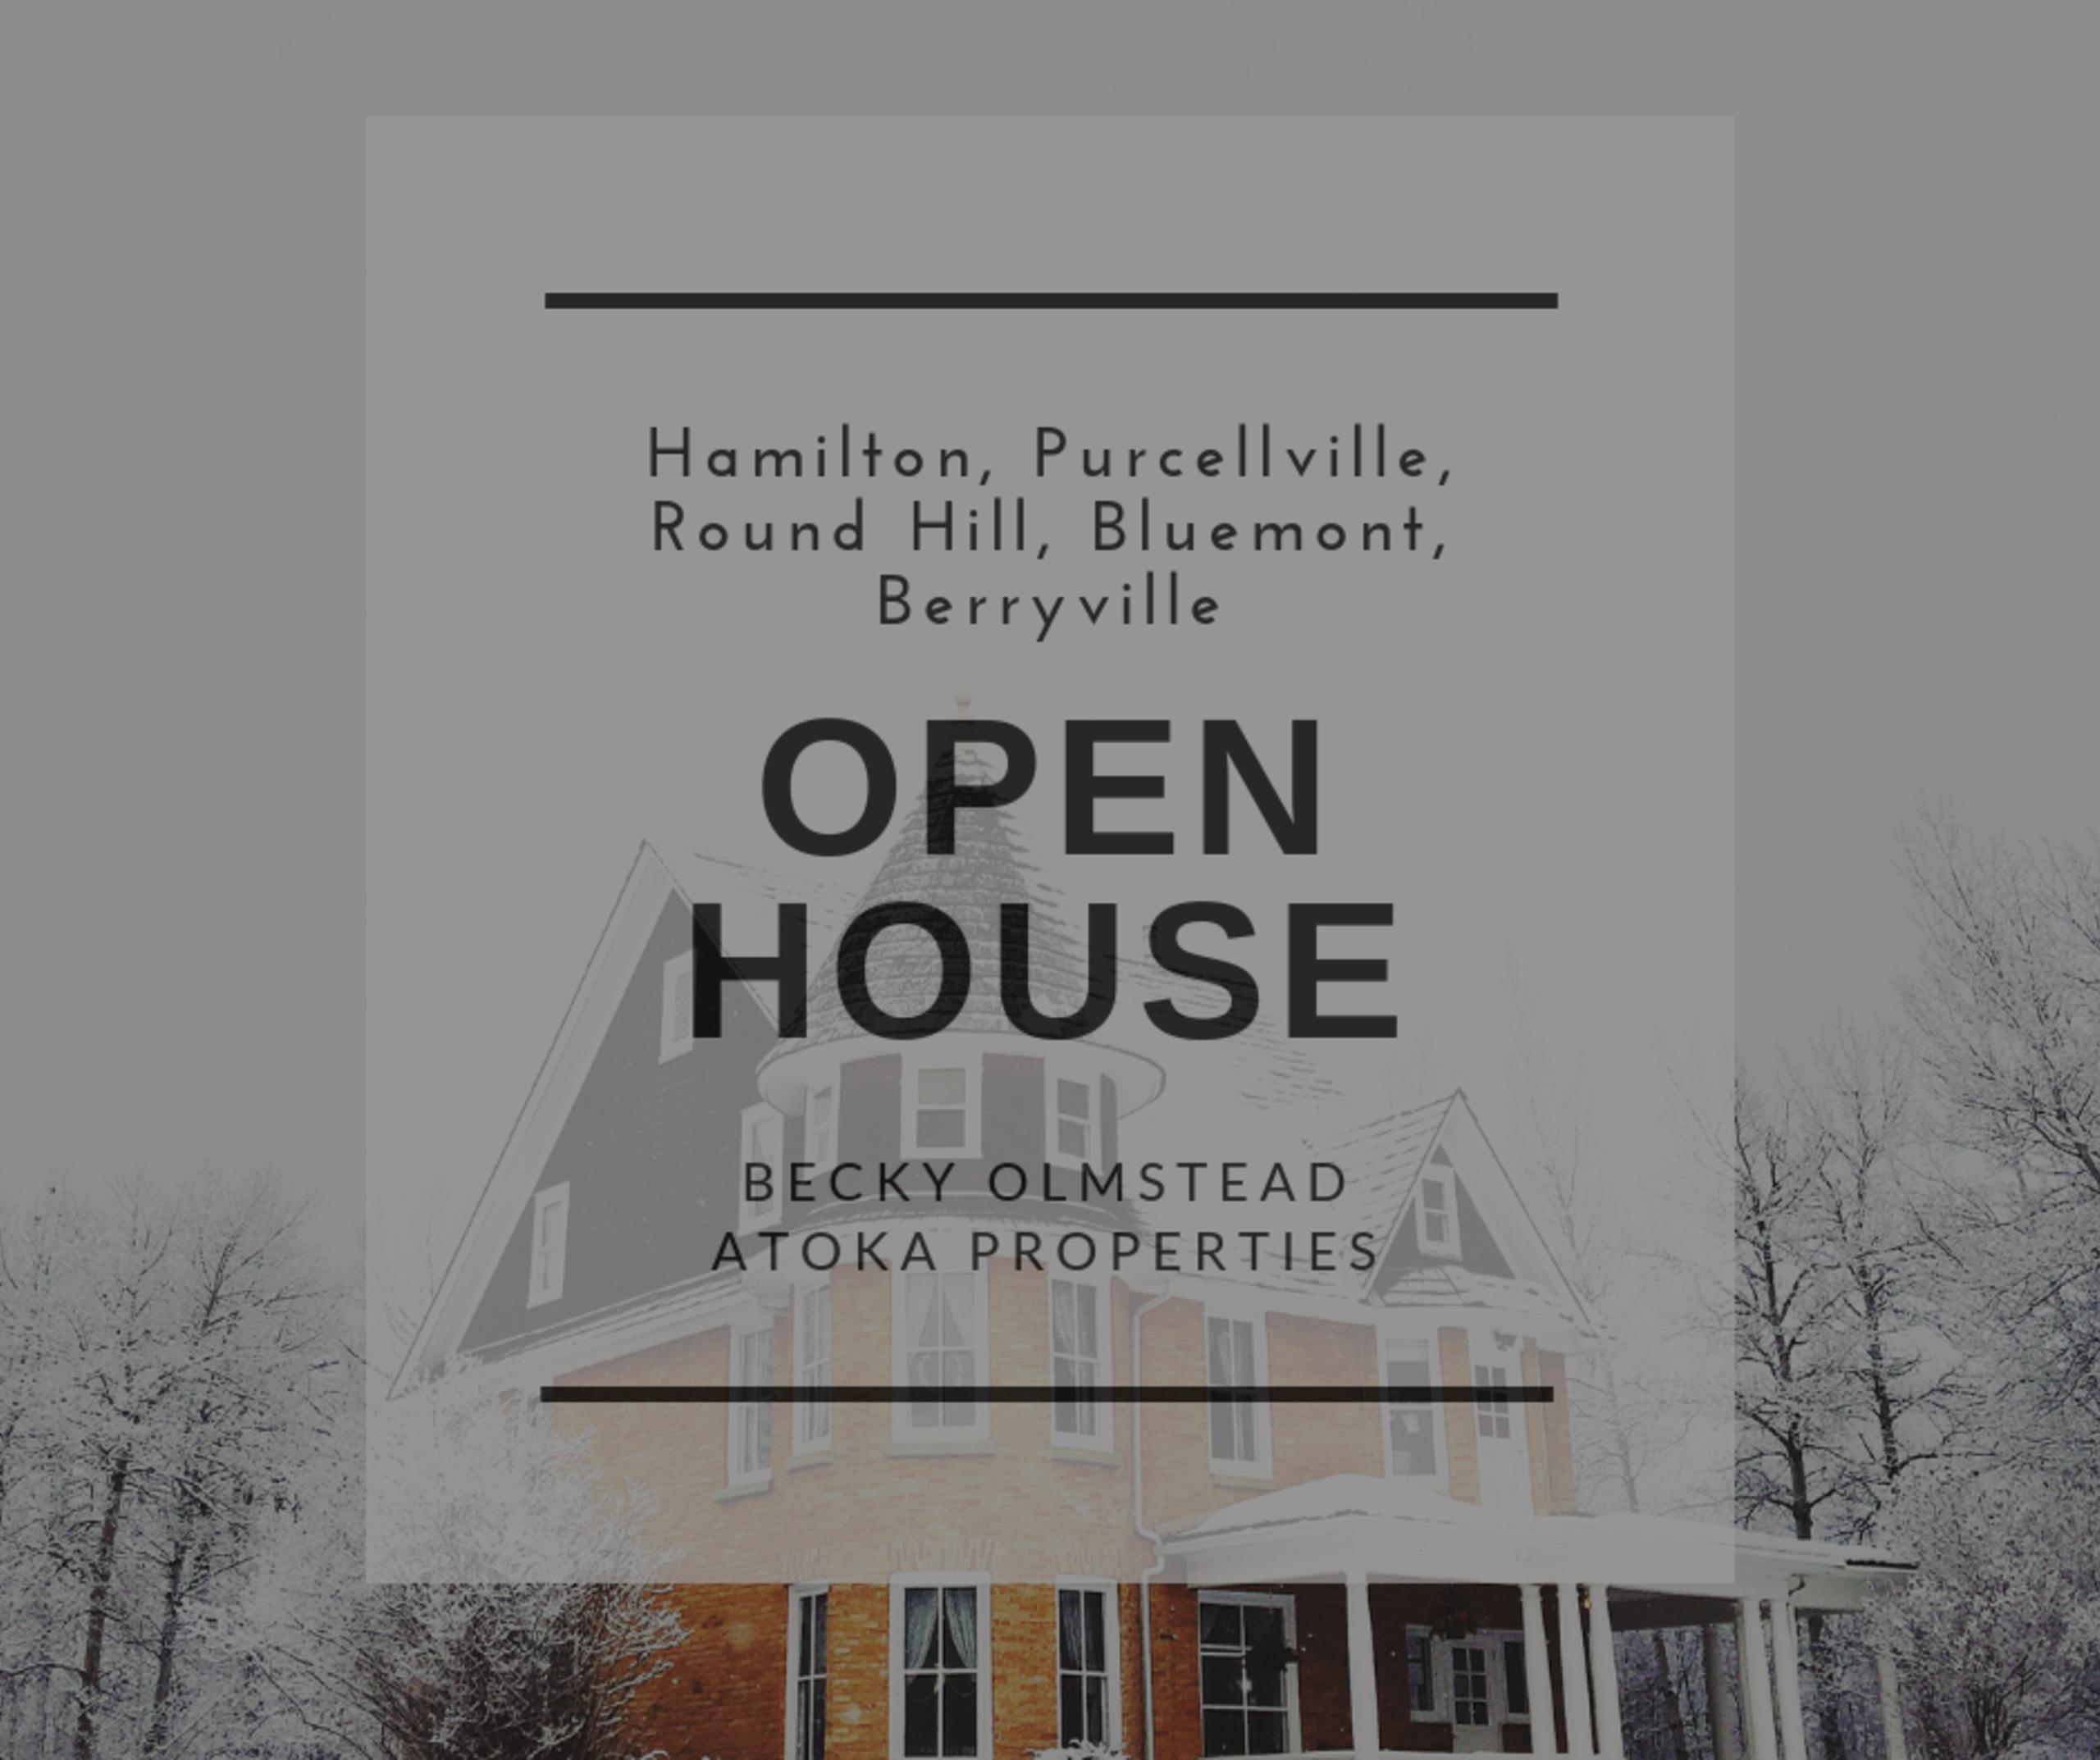 Open House 12/15/18 – 12/16/18